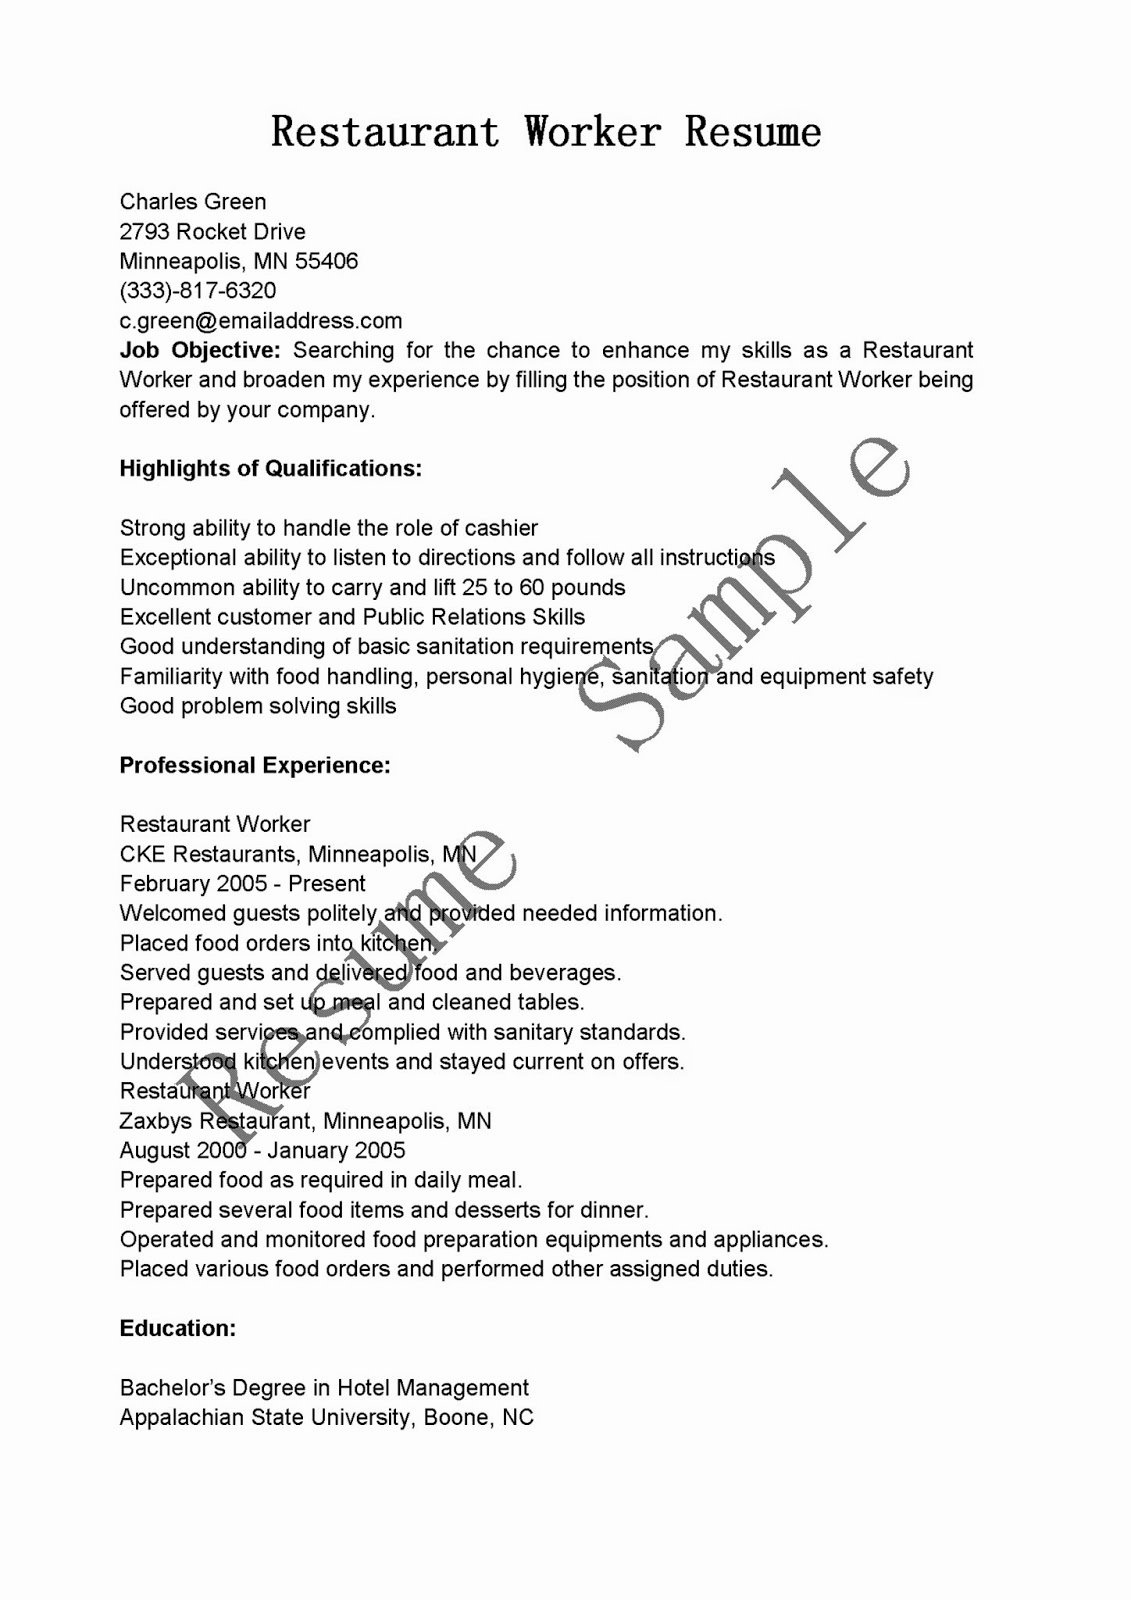 Sample Resume for Restaurant Awesome Resume Samples Restaurant Worker Resume Sample